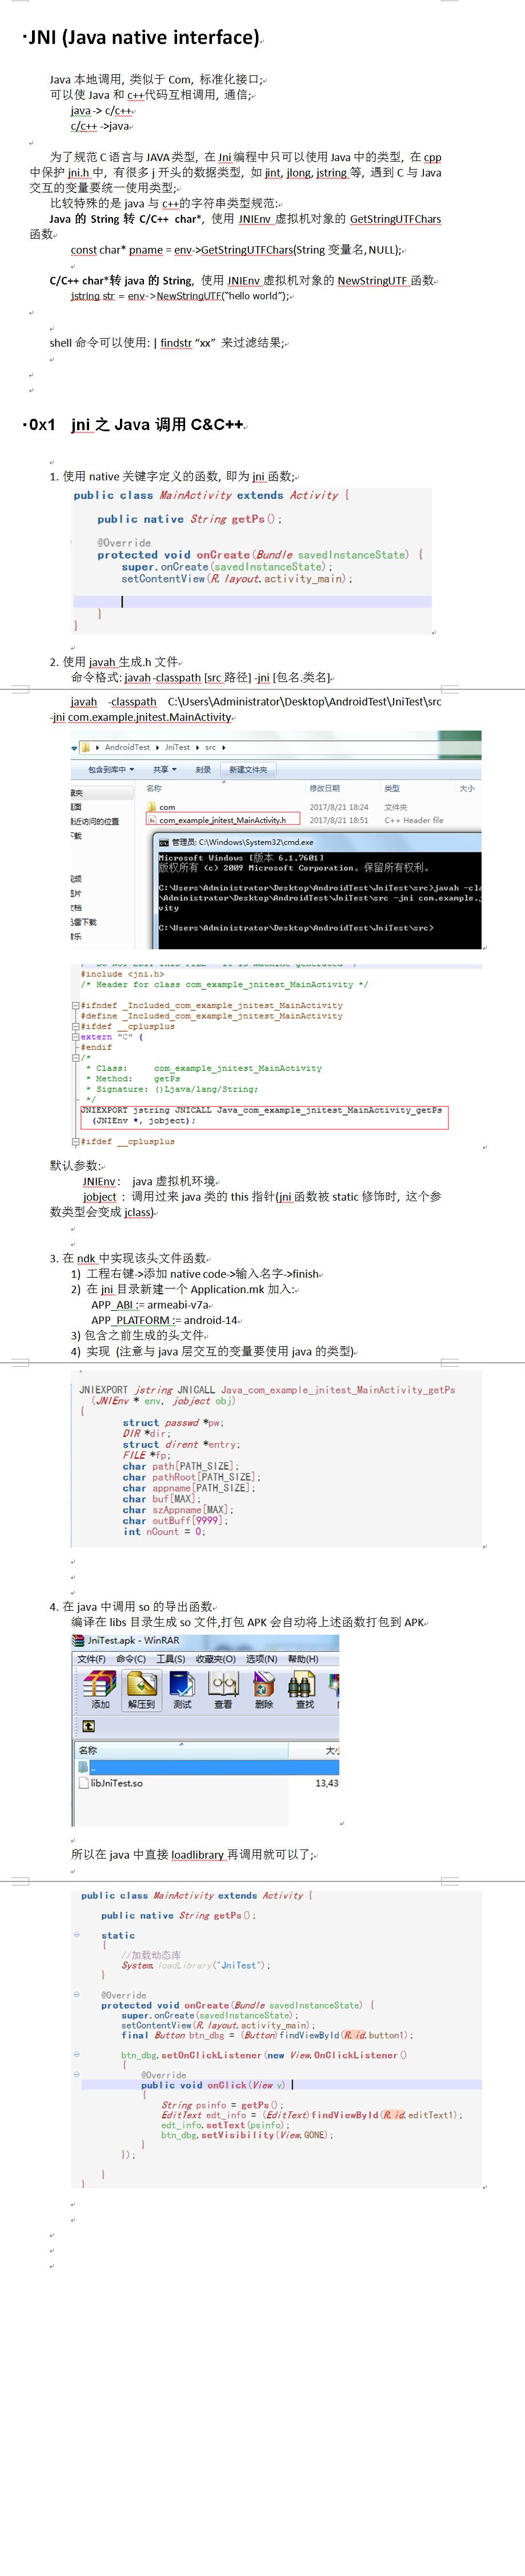 jni之Java调用C_C__.png